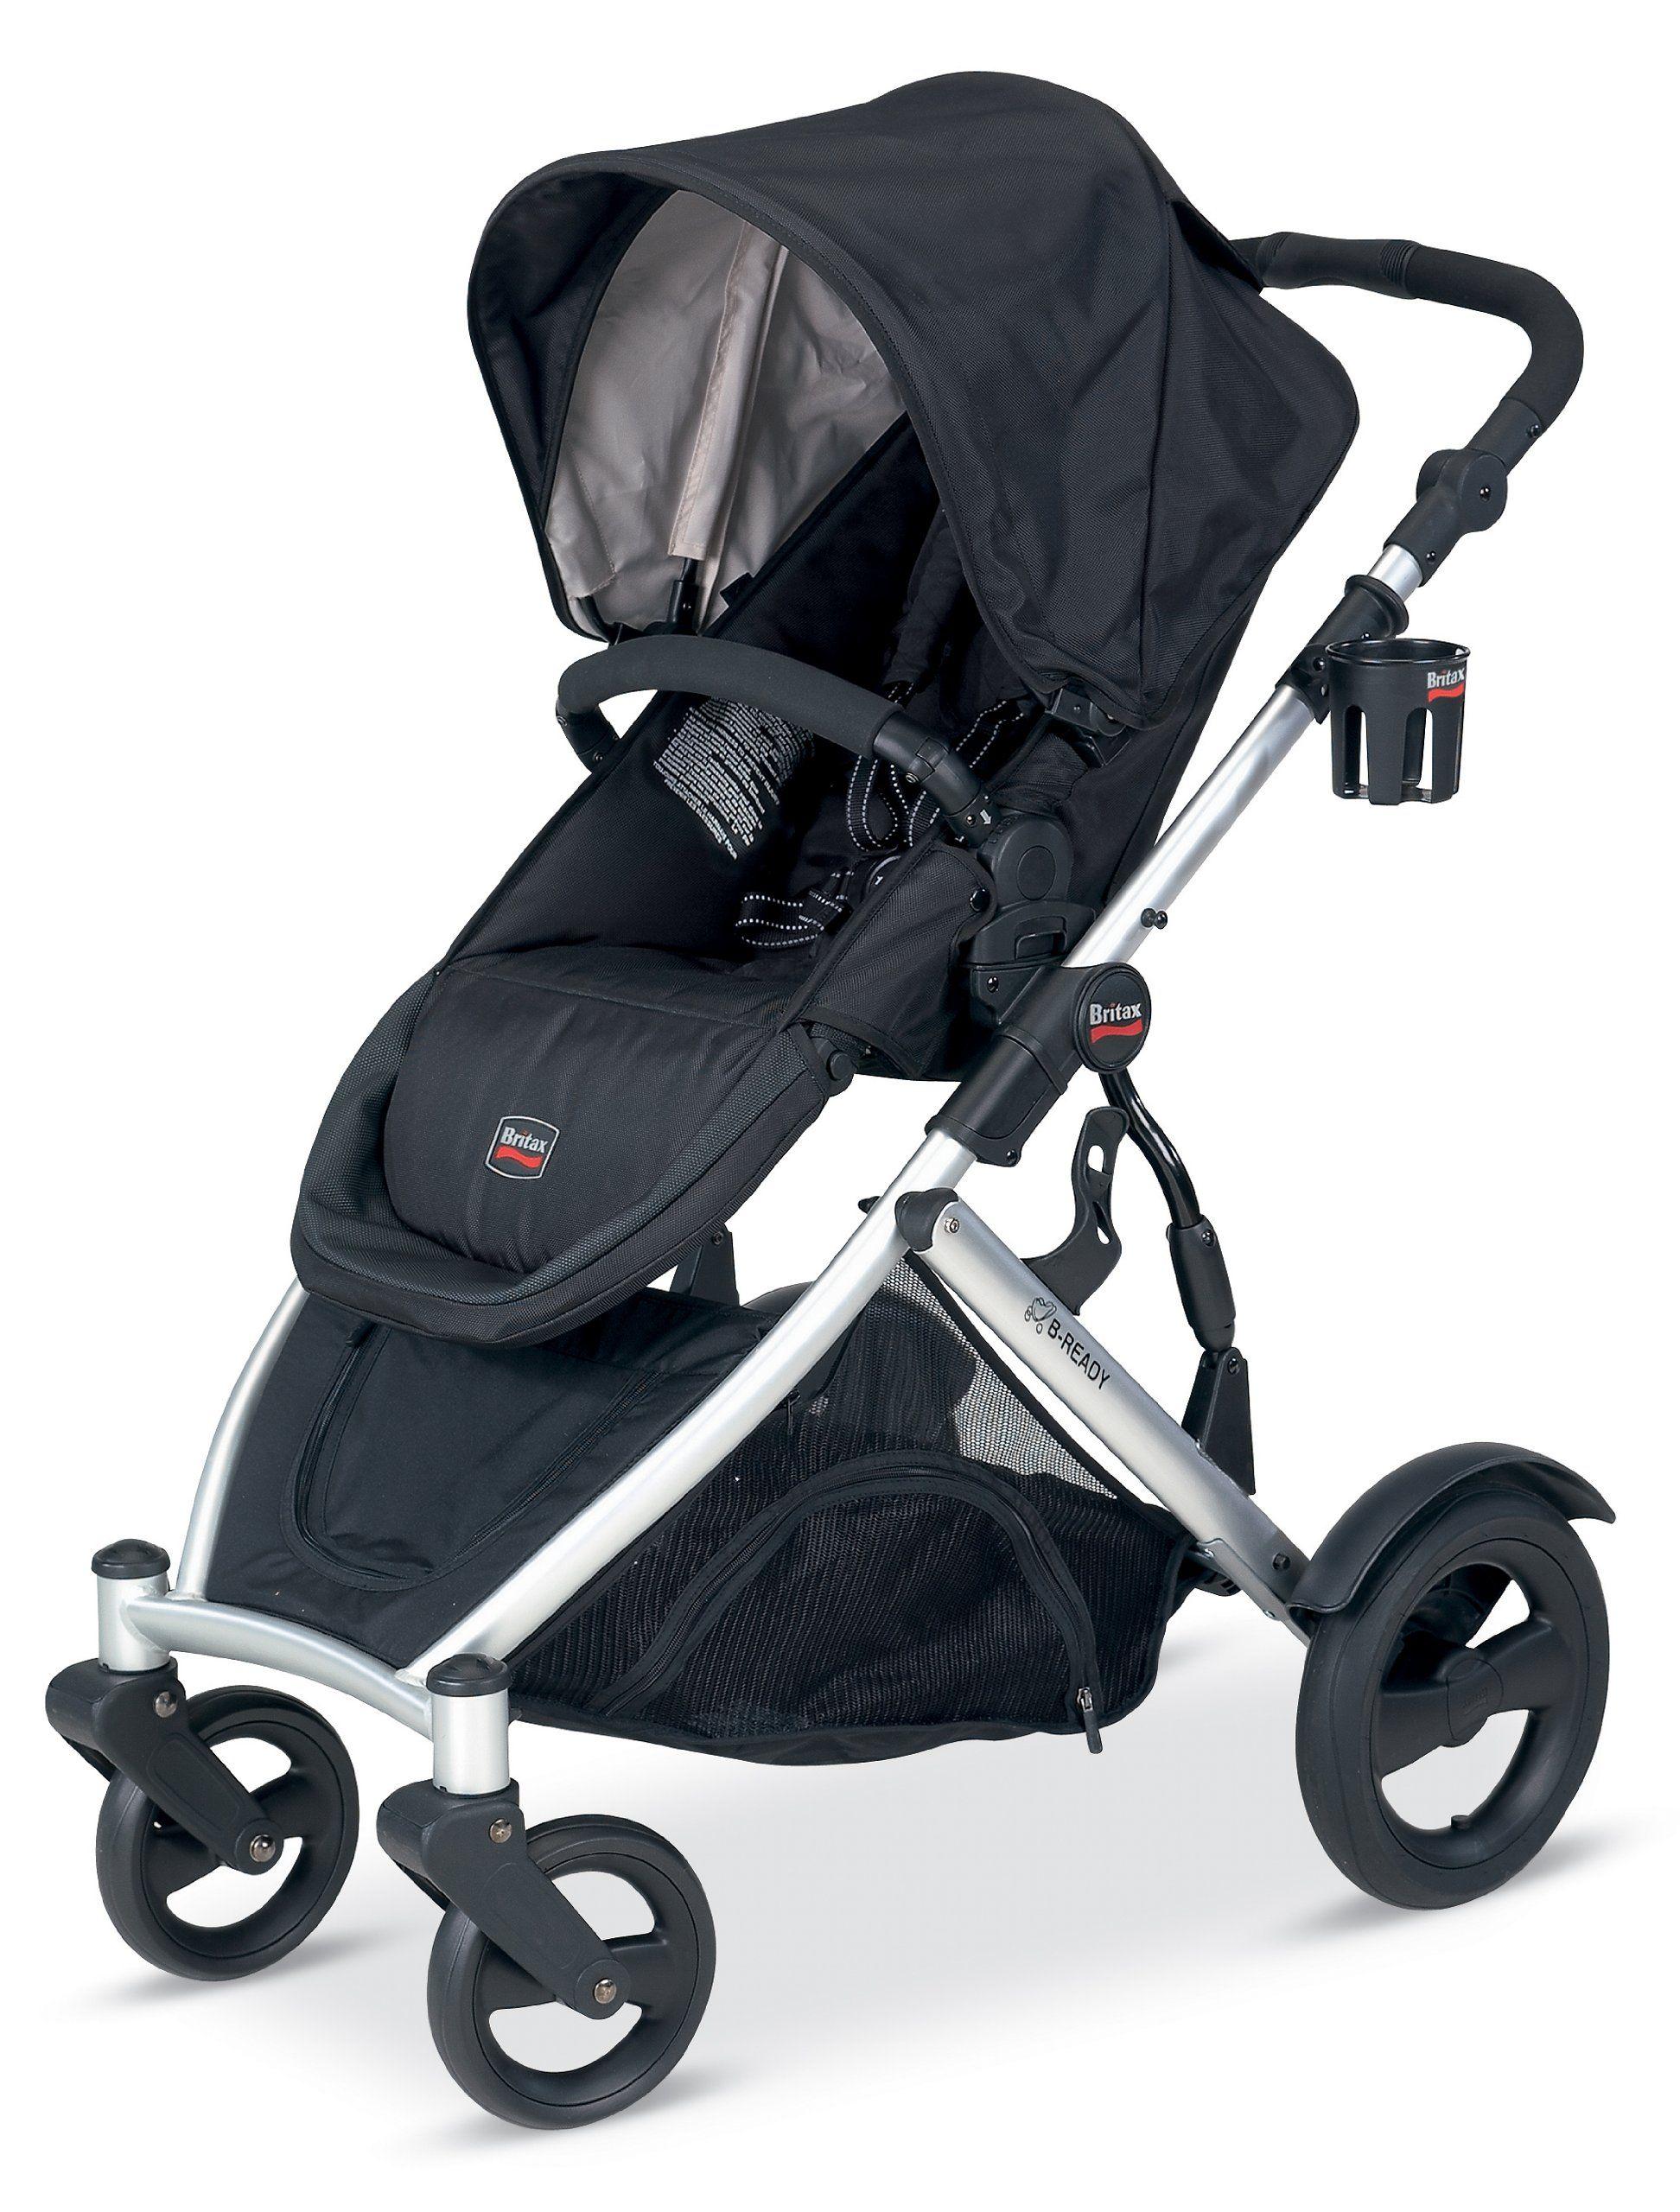 Amazon Com Britax B Ready Stroller Black Infant Car Seat Stroller Travel Systems Baby With Images Britax B Ready Best Baby Strollers Britax B Ready Stroller